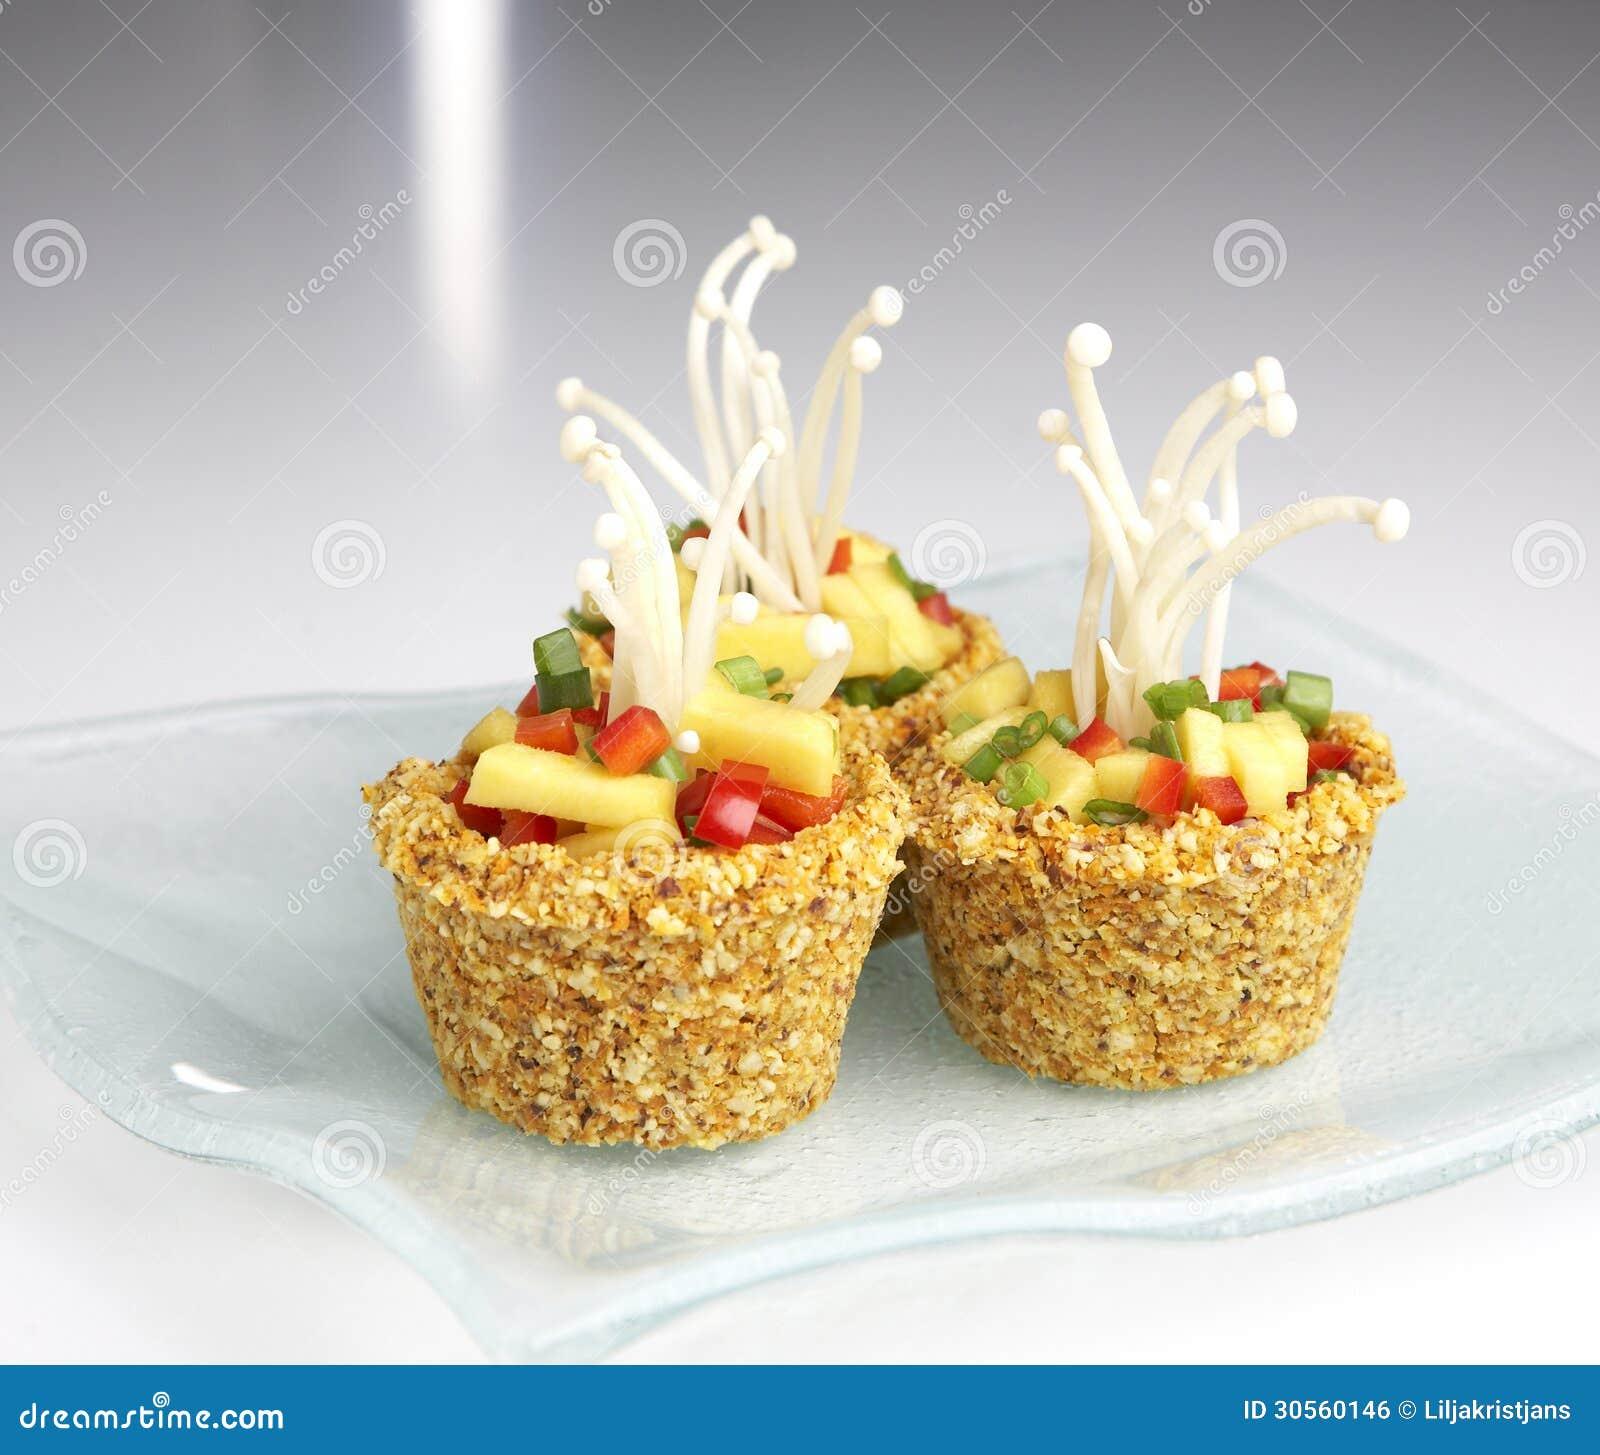 Raw food shells stuffed with raw food formed like a cupcake.